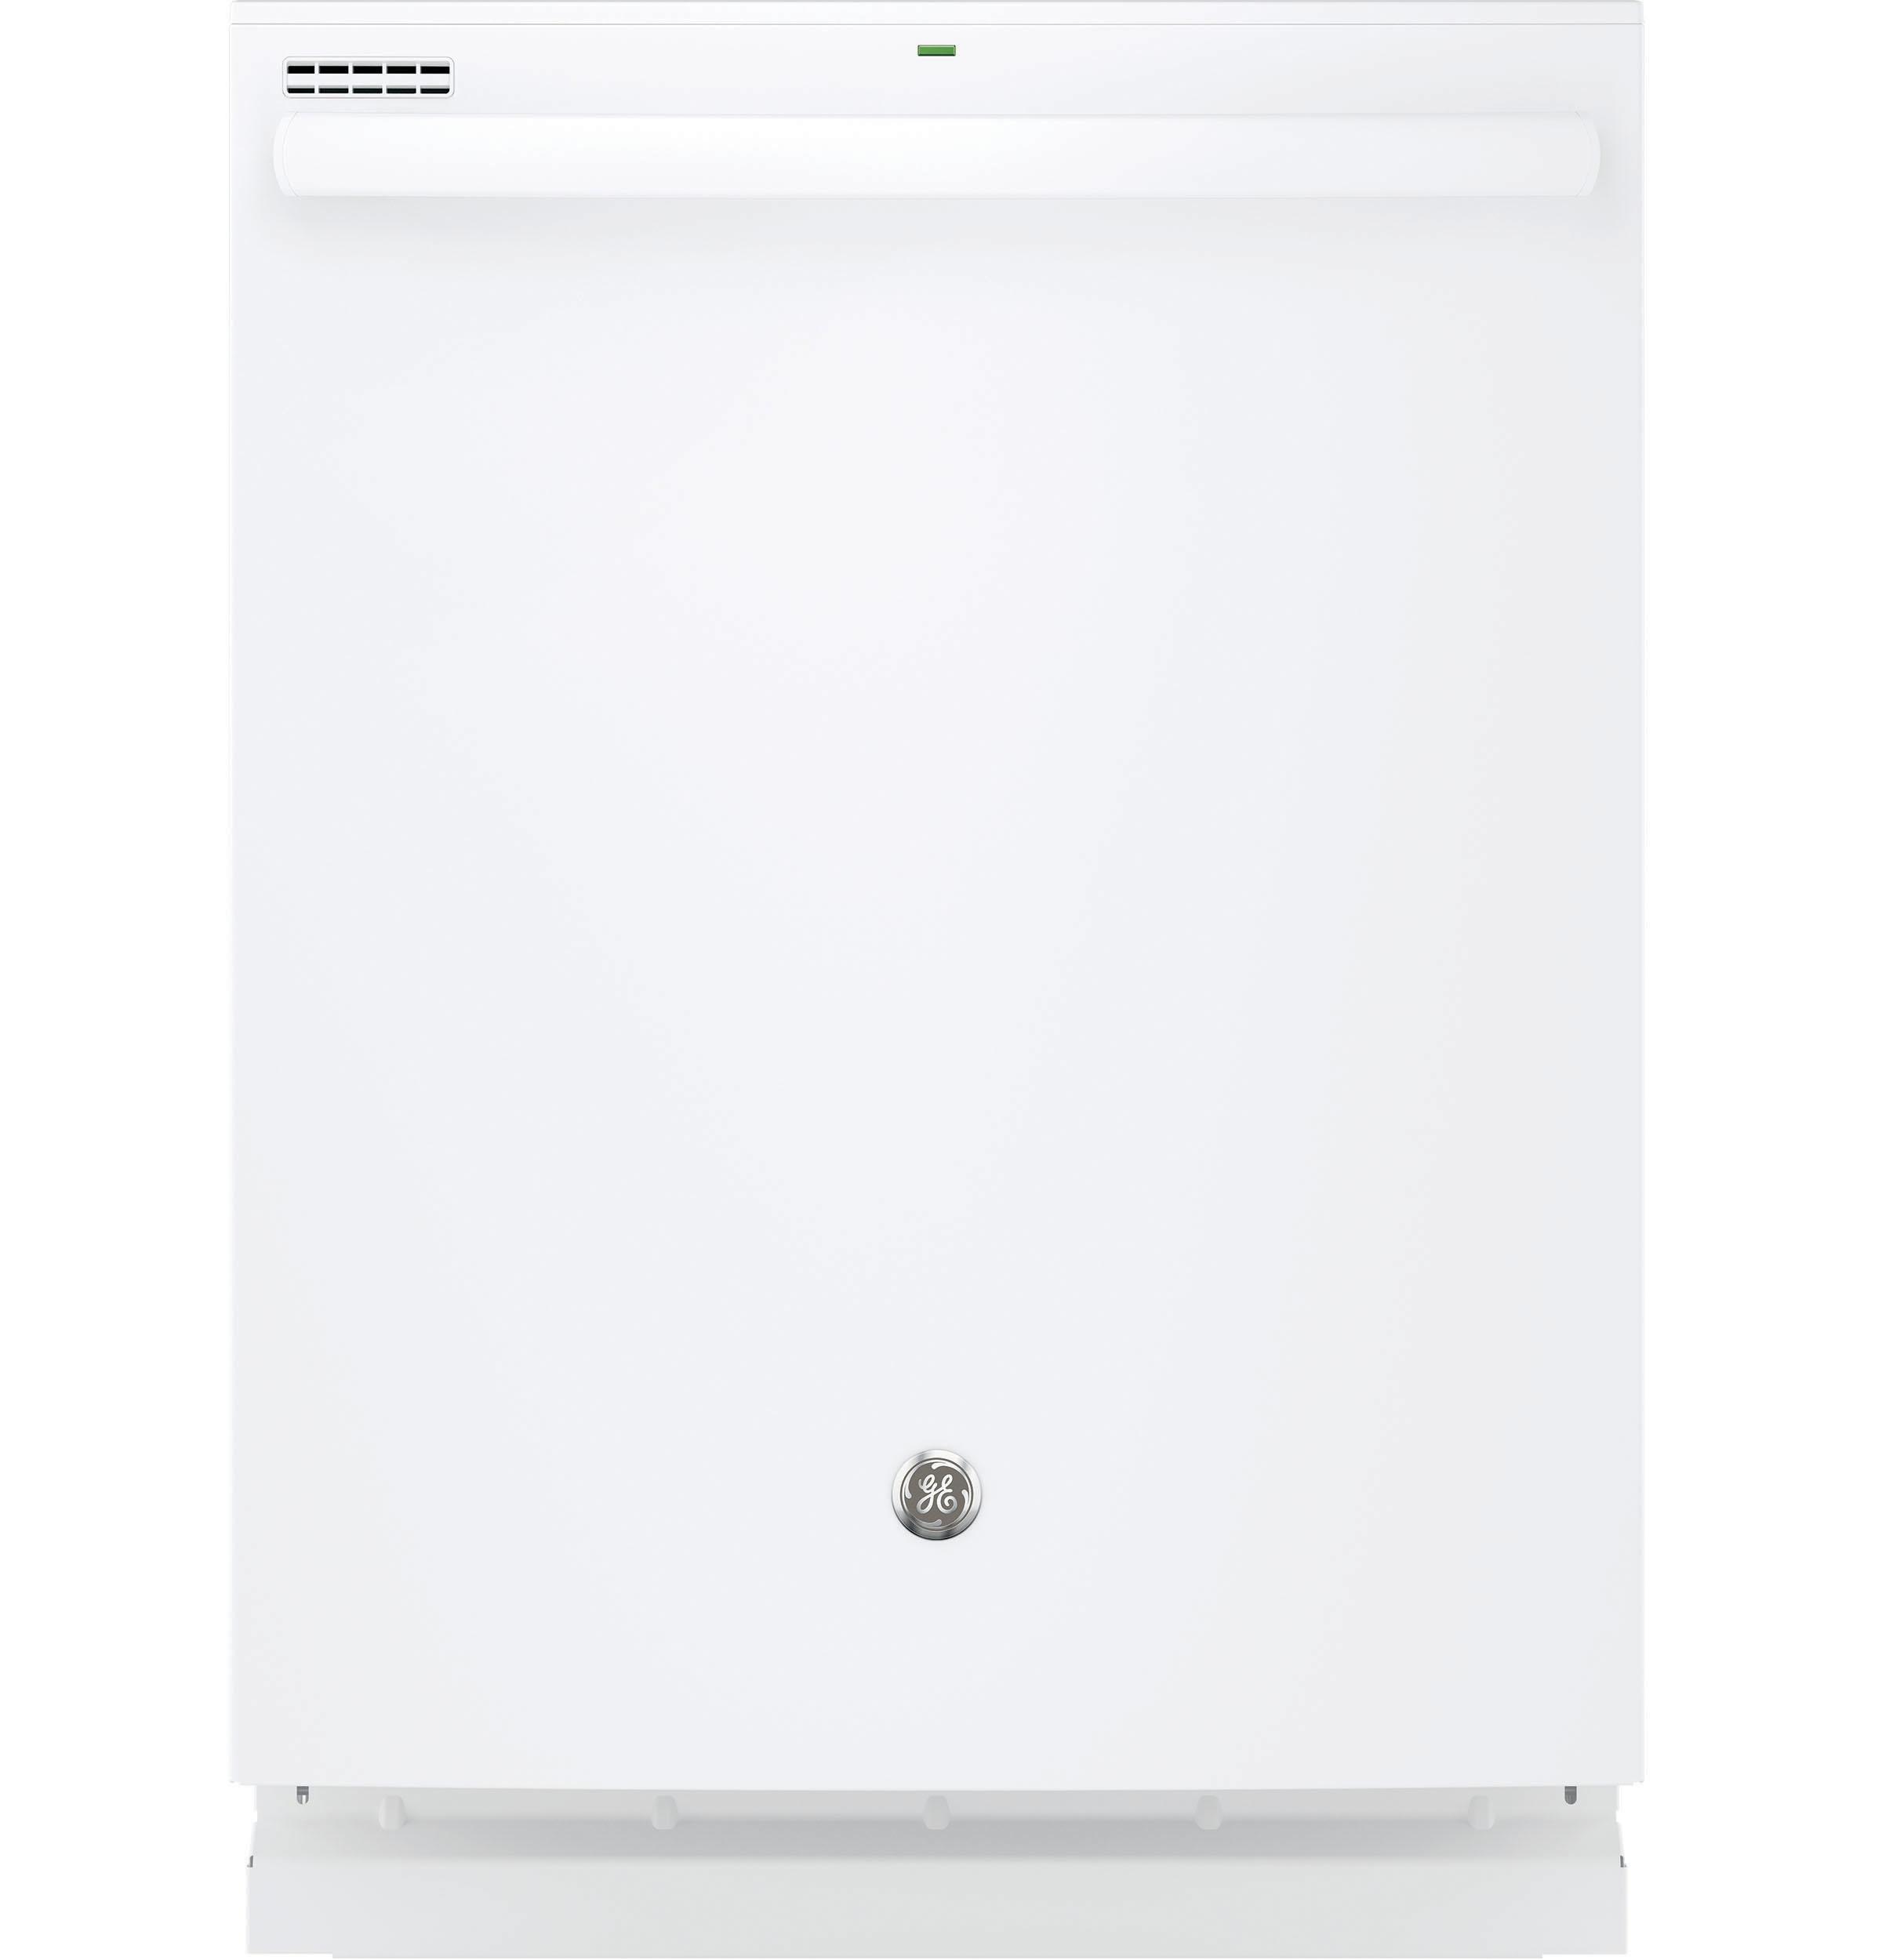 GE GE® Hybrid Stainless Steel Interior Dishwasher with Hidden Controls